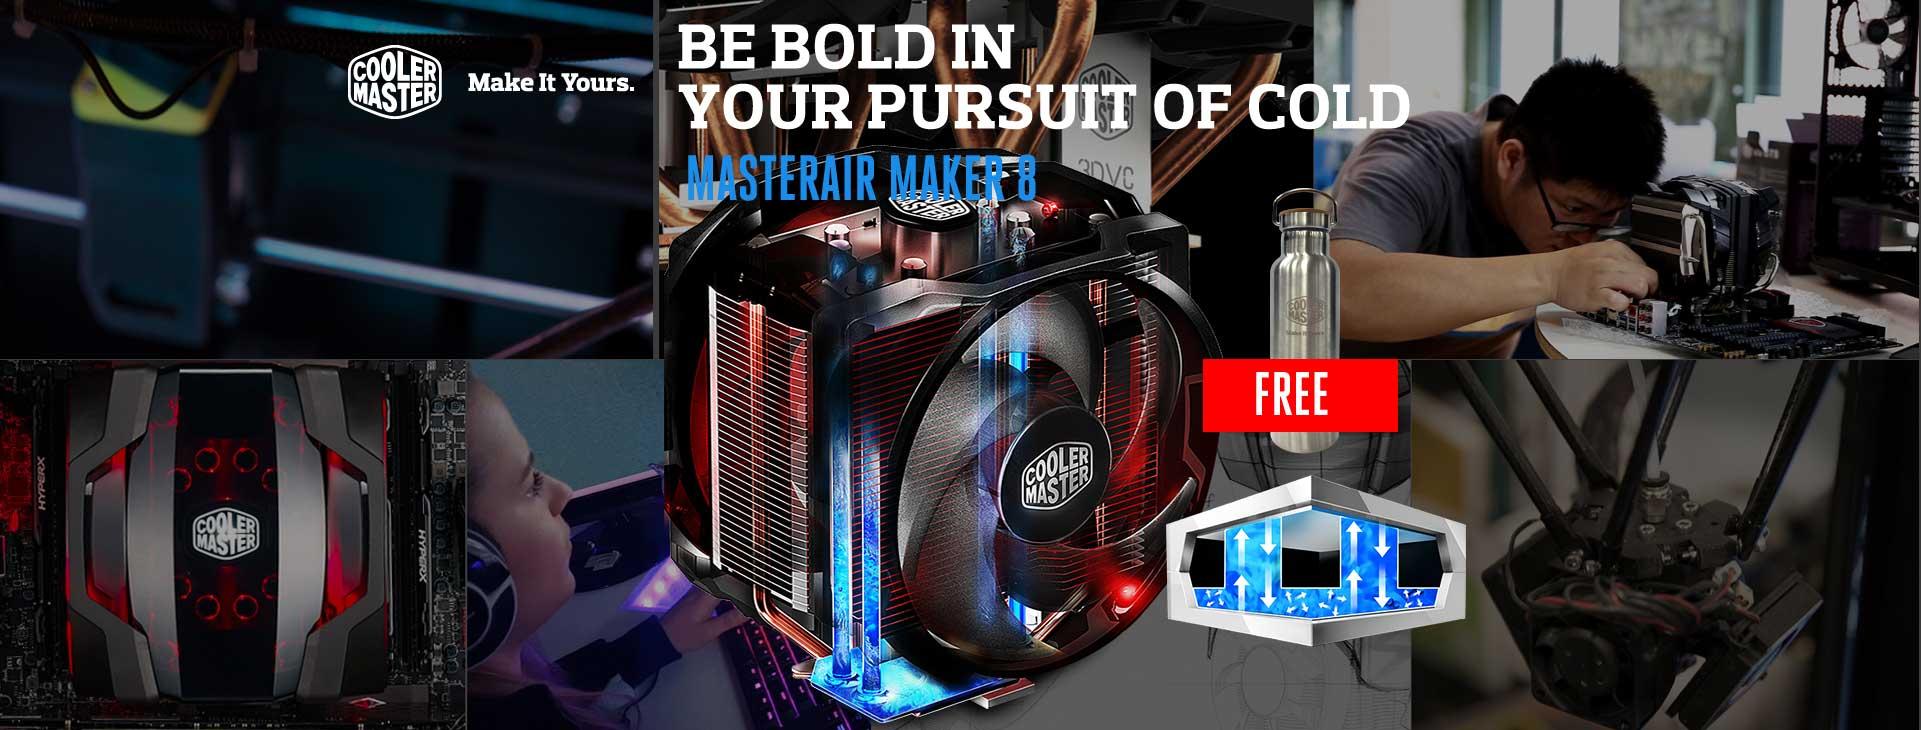 Cooler-Master-MasterAir-Maker-8-CPU-Cooler-MAZ-T8PN-418PR-R1-banner-1